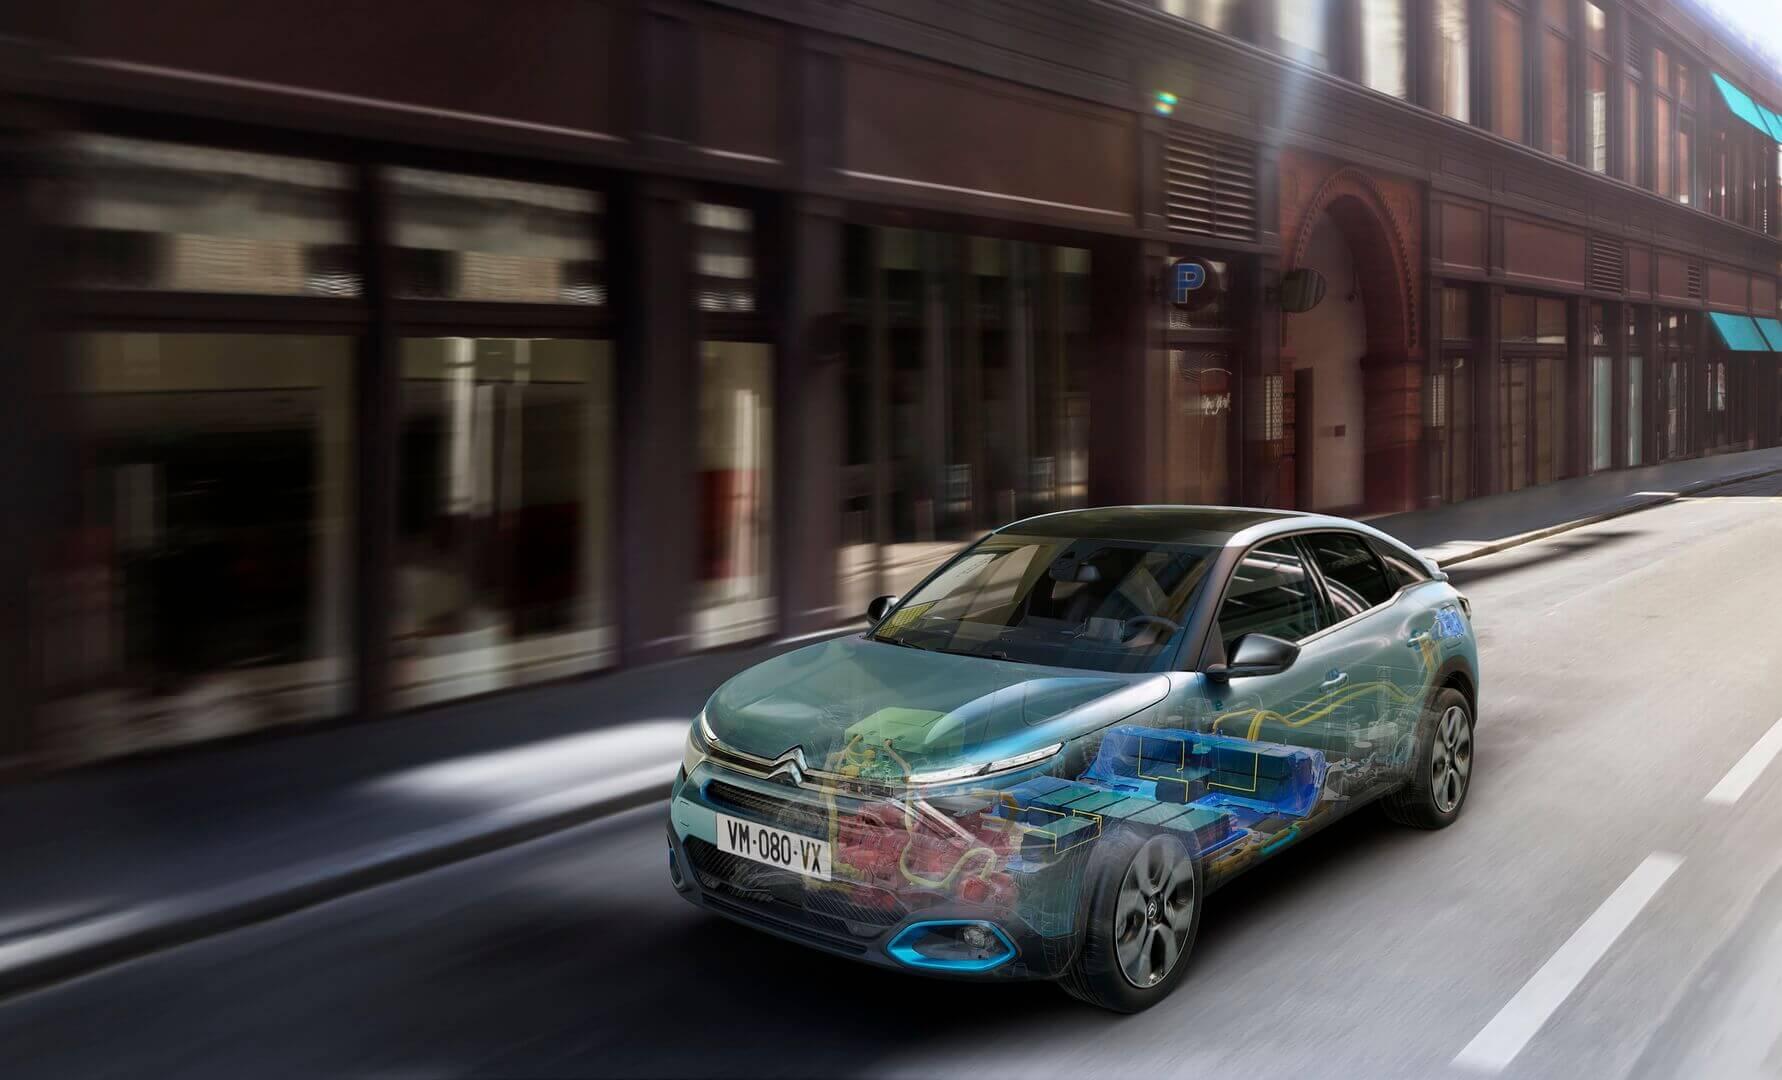 Электрокроссовер Citroën ë-C4 предлагает запас хода до 350 км по WLTP